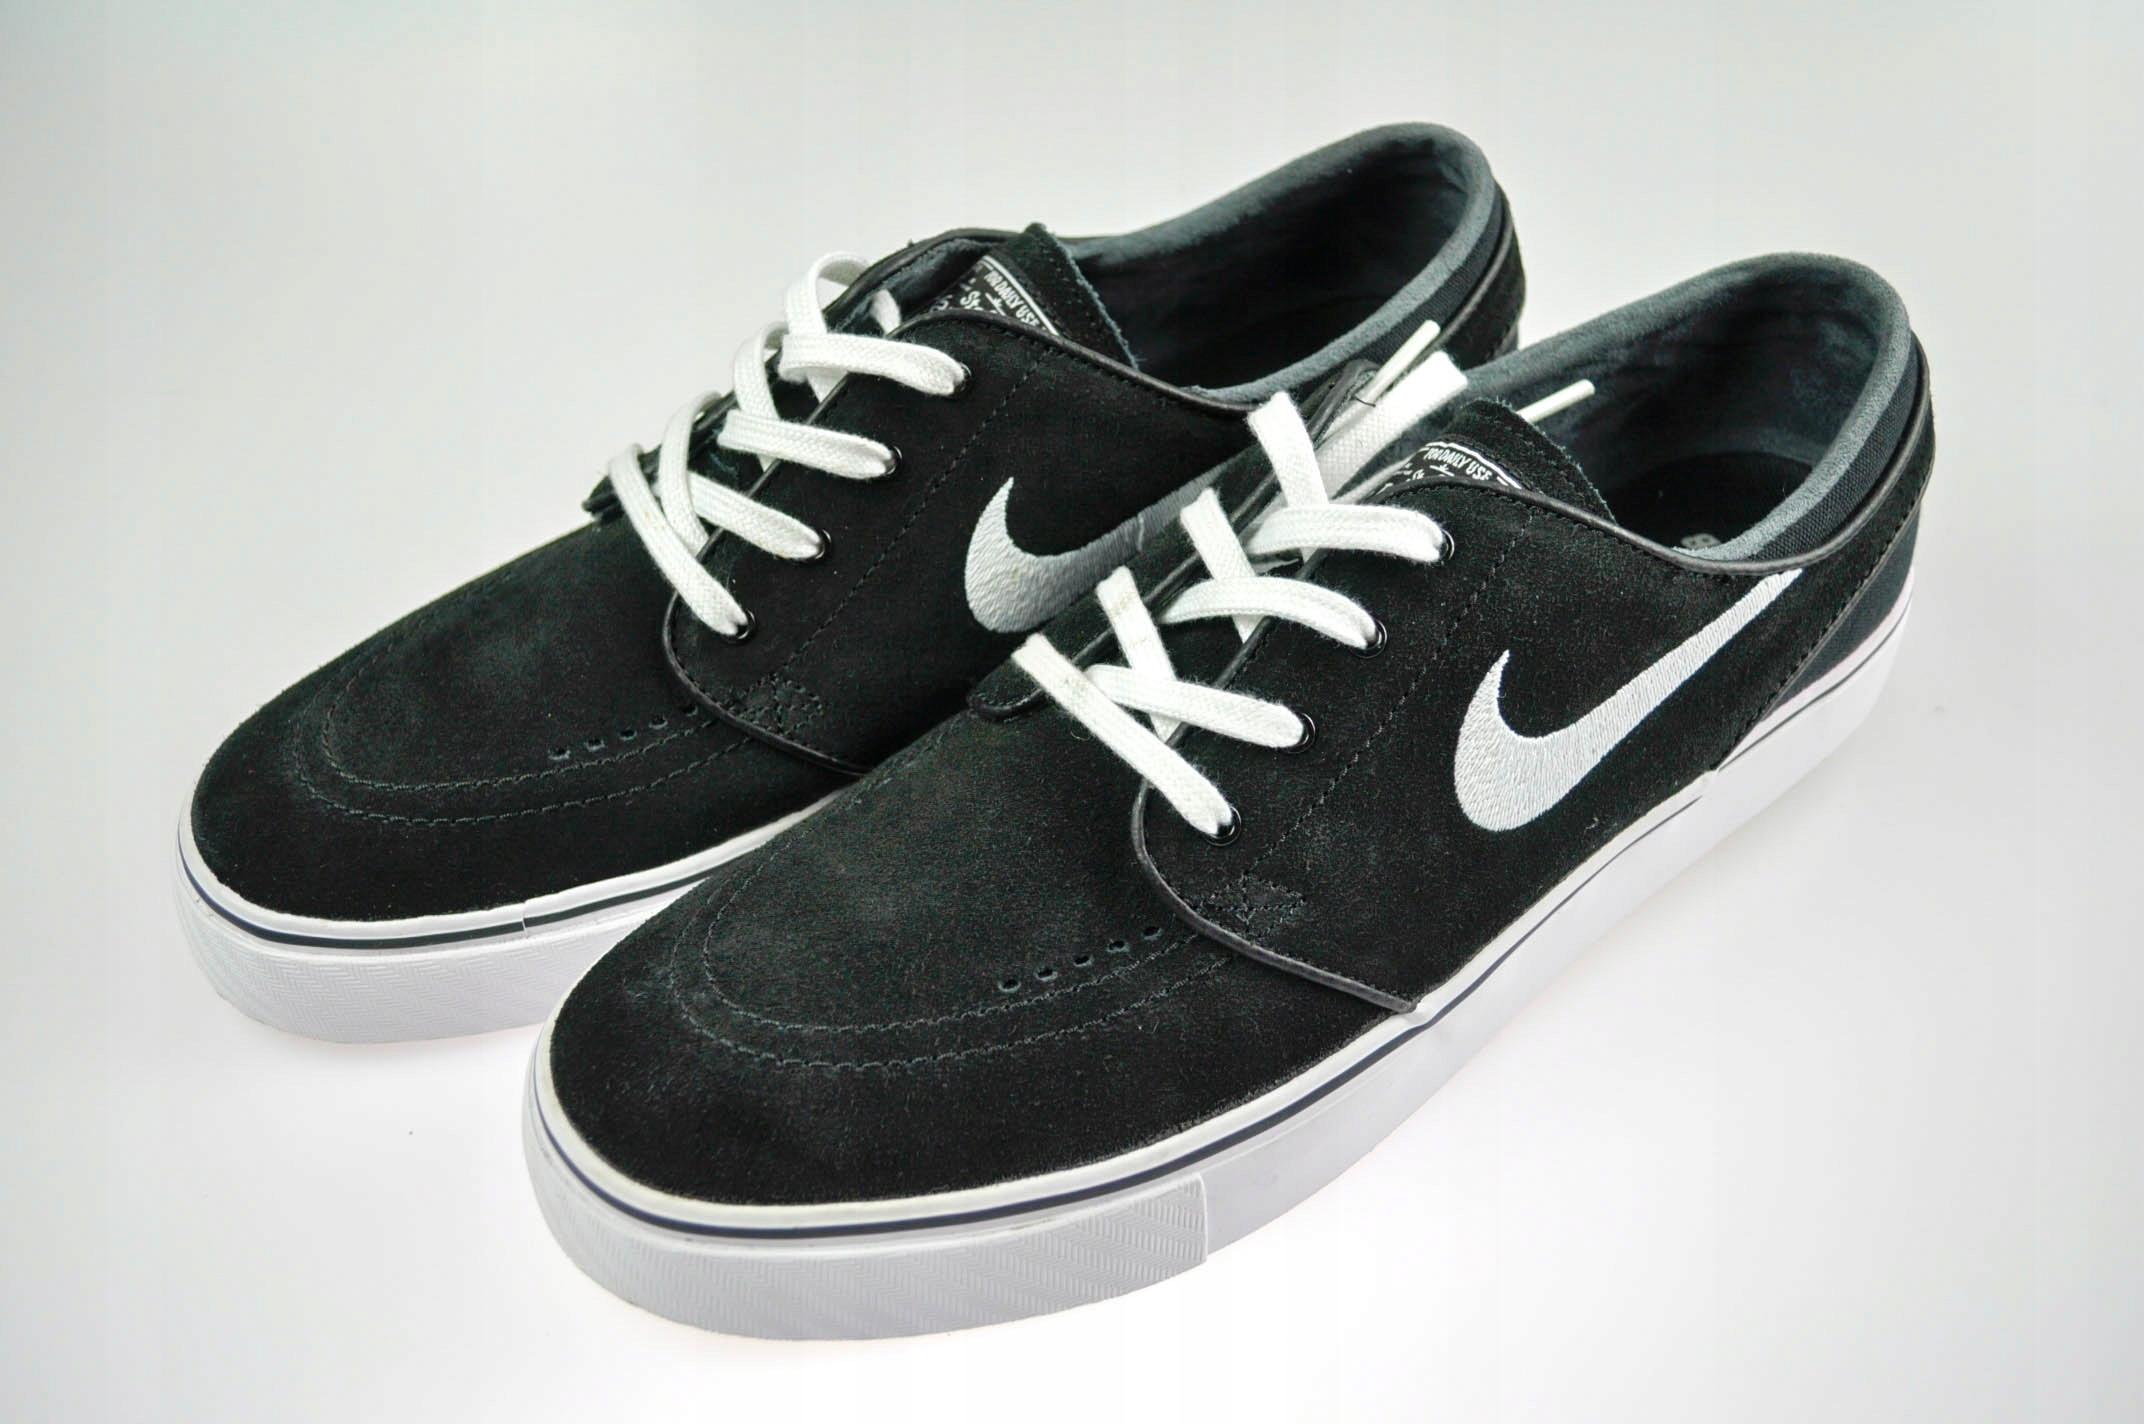 buy online 39ec3 38d52 Nike SB ZOOM STEFAN JANOSKI r.44,5 !Wyprzedaż!